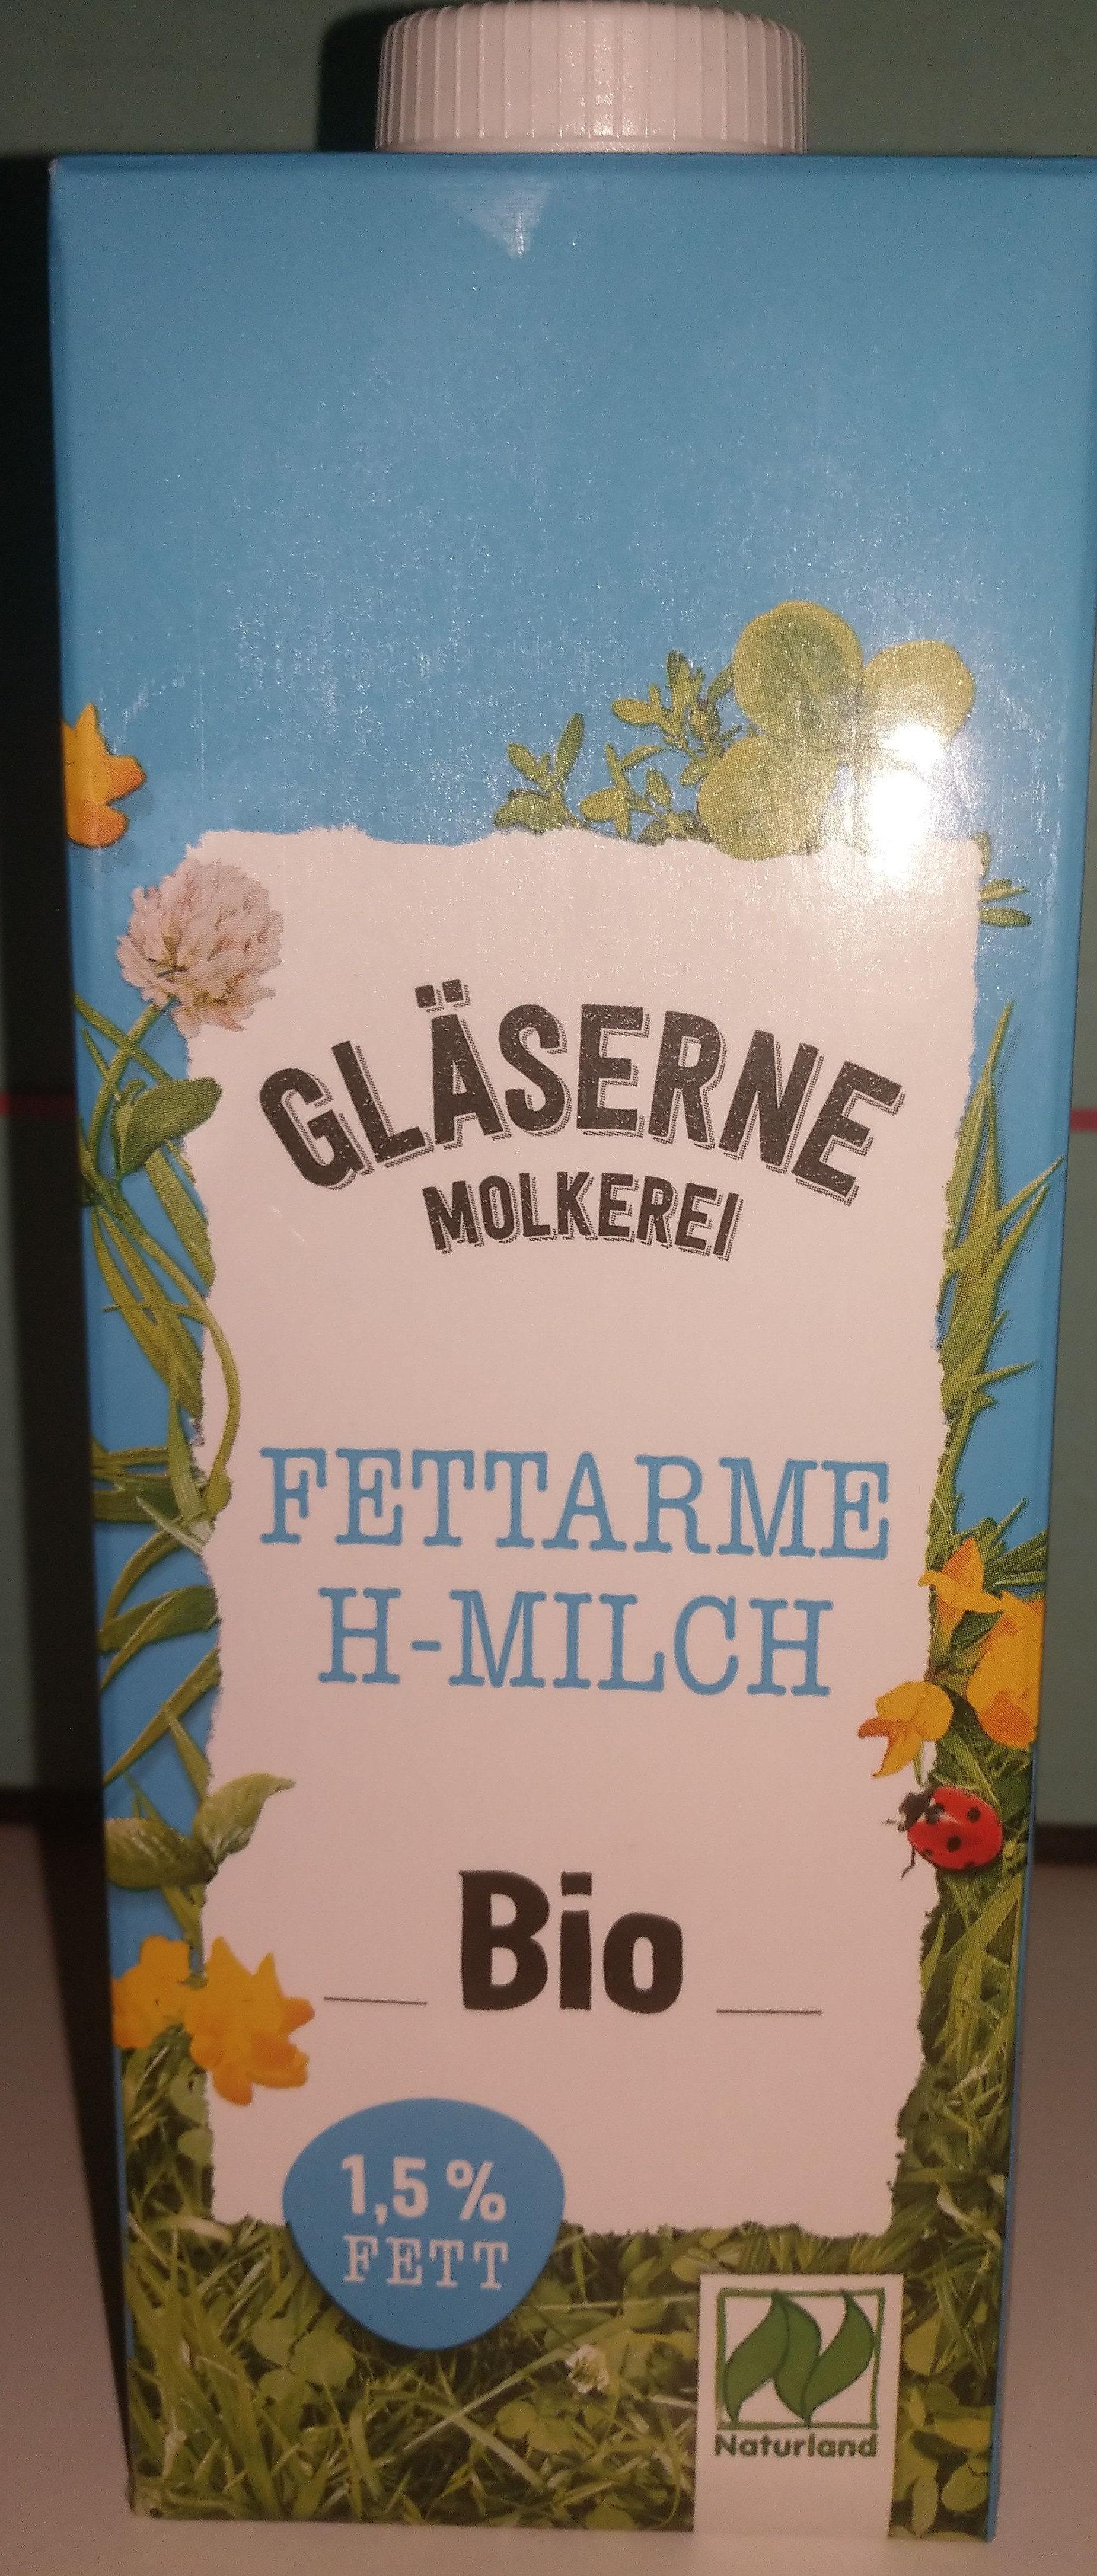 Fettarme H-Milch Bio 1,5% Fett - Produkt